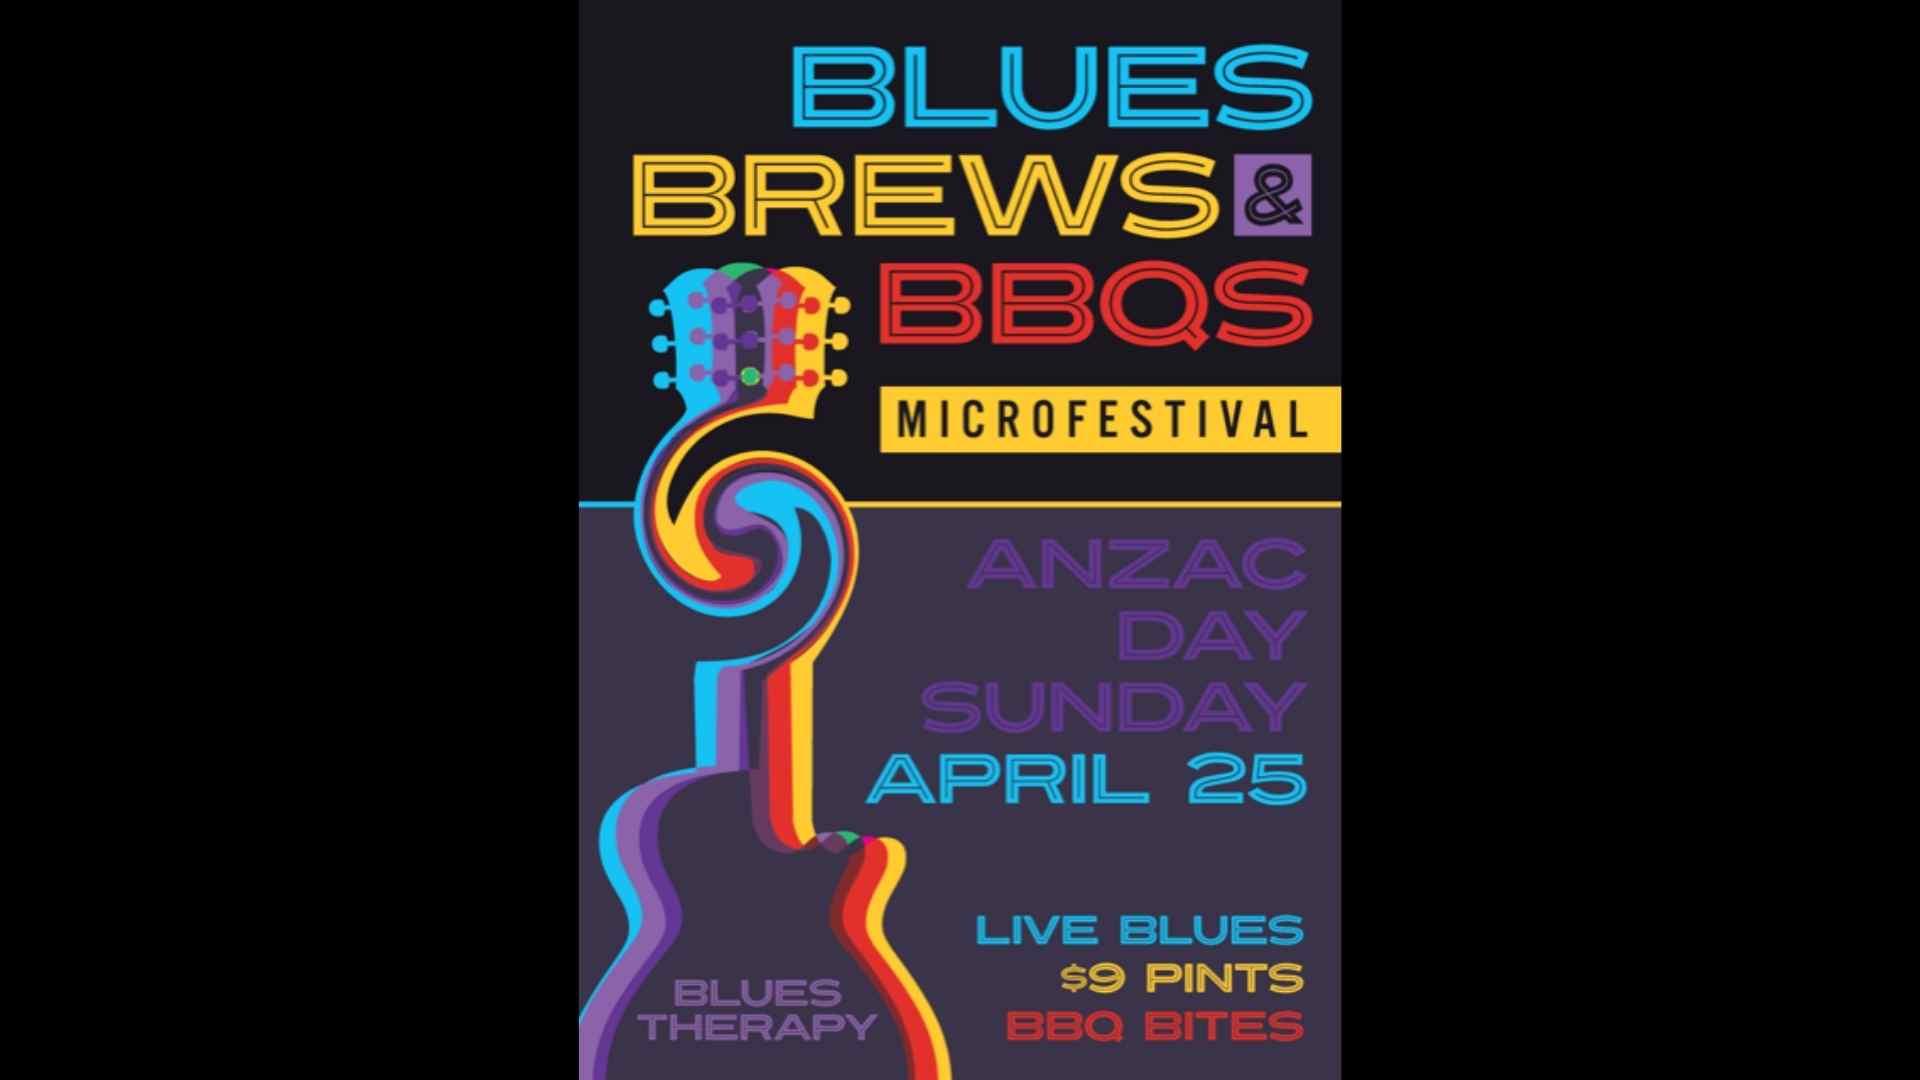 Blues-Brews-BBQs-Bar-Therapy-ANZAC-DAY